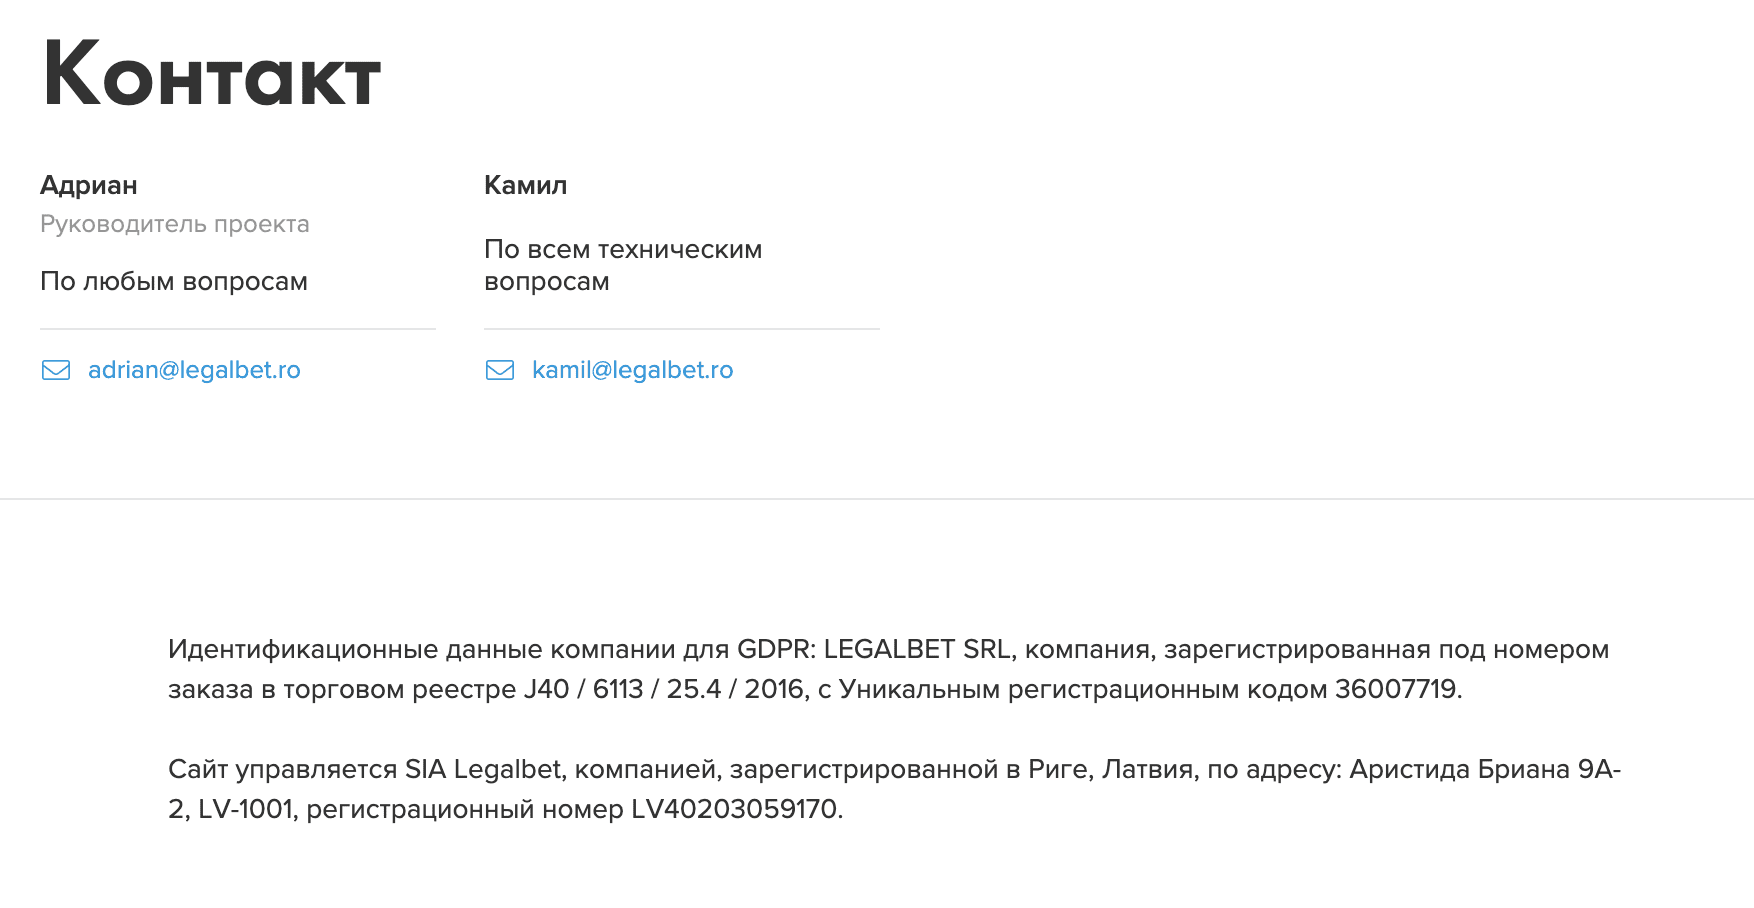 Контакты на сайте  Легалбет (www Legalbet ru)